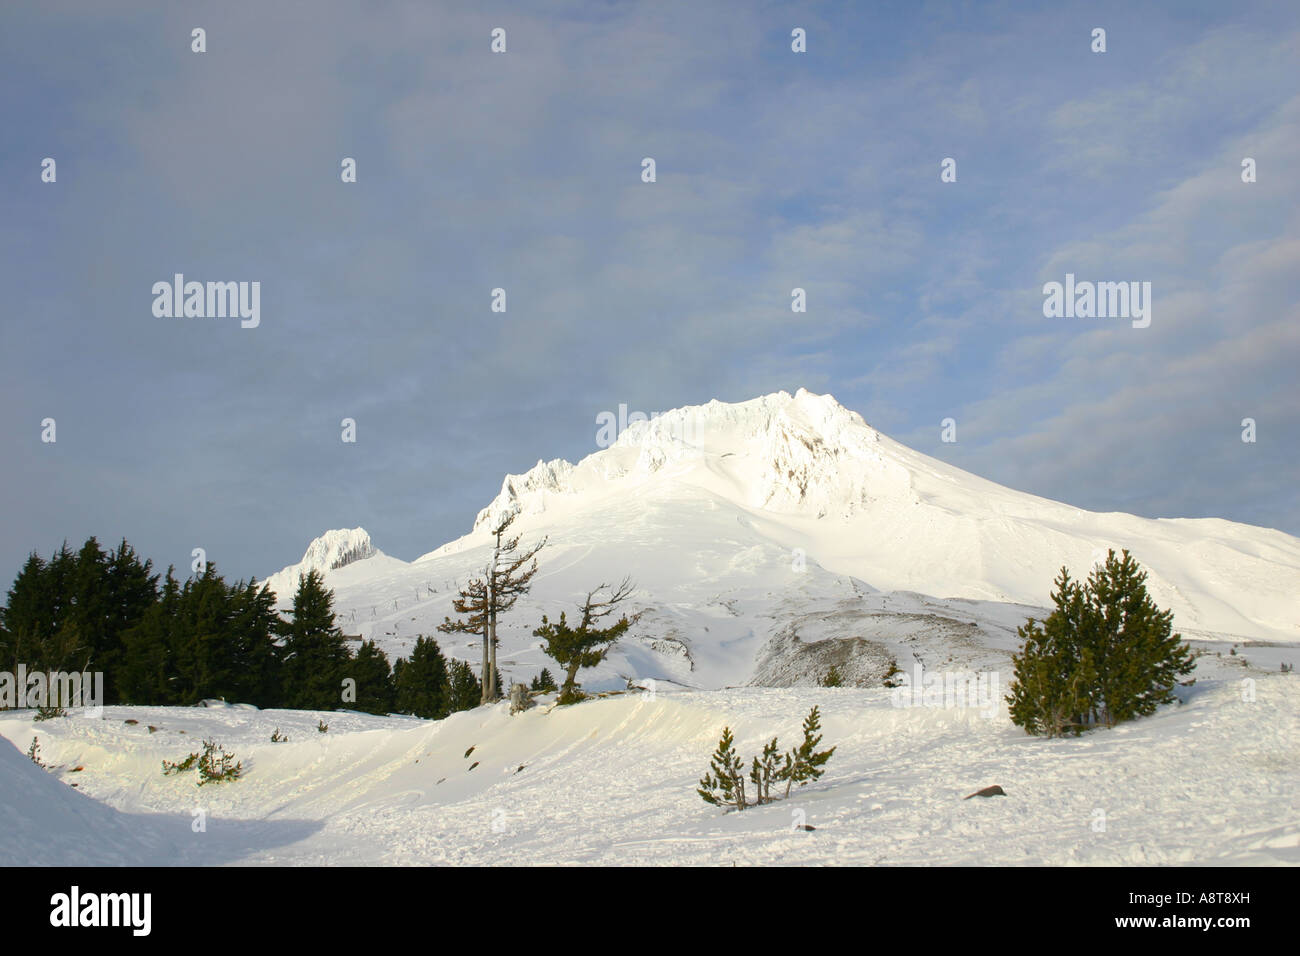 Mt Hood, Snowy Mountain, Blue Sky, Sunshine - Stock Image